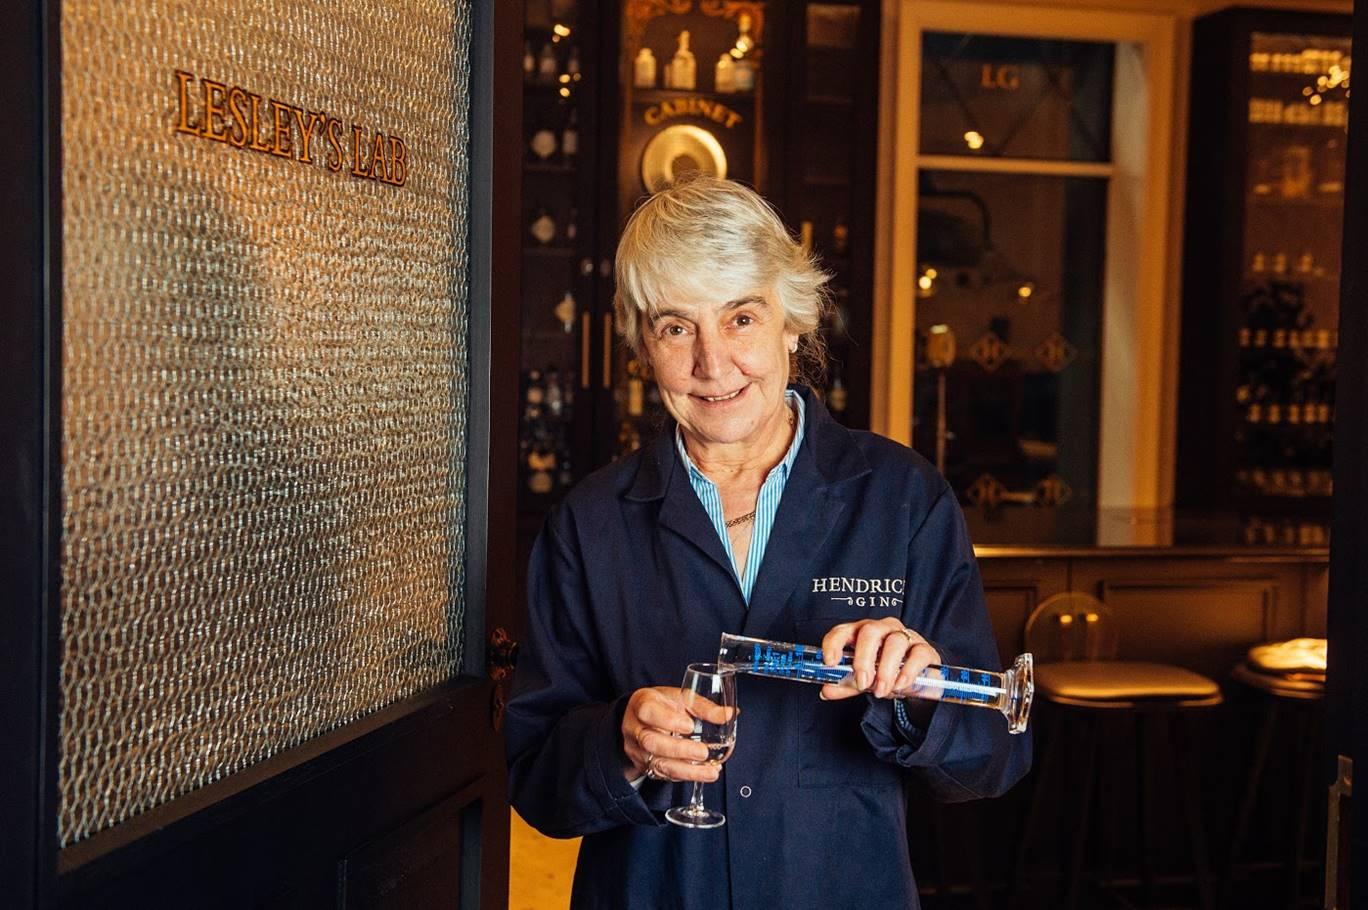 Lesley Gracie, Hendrick's master distiller